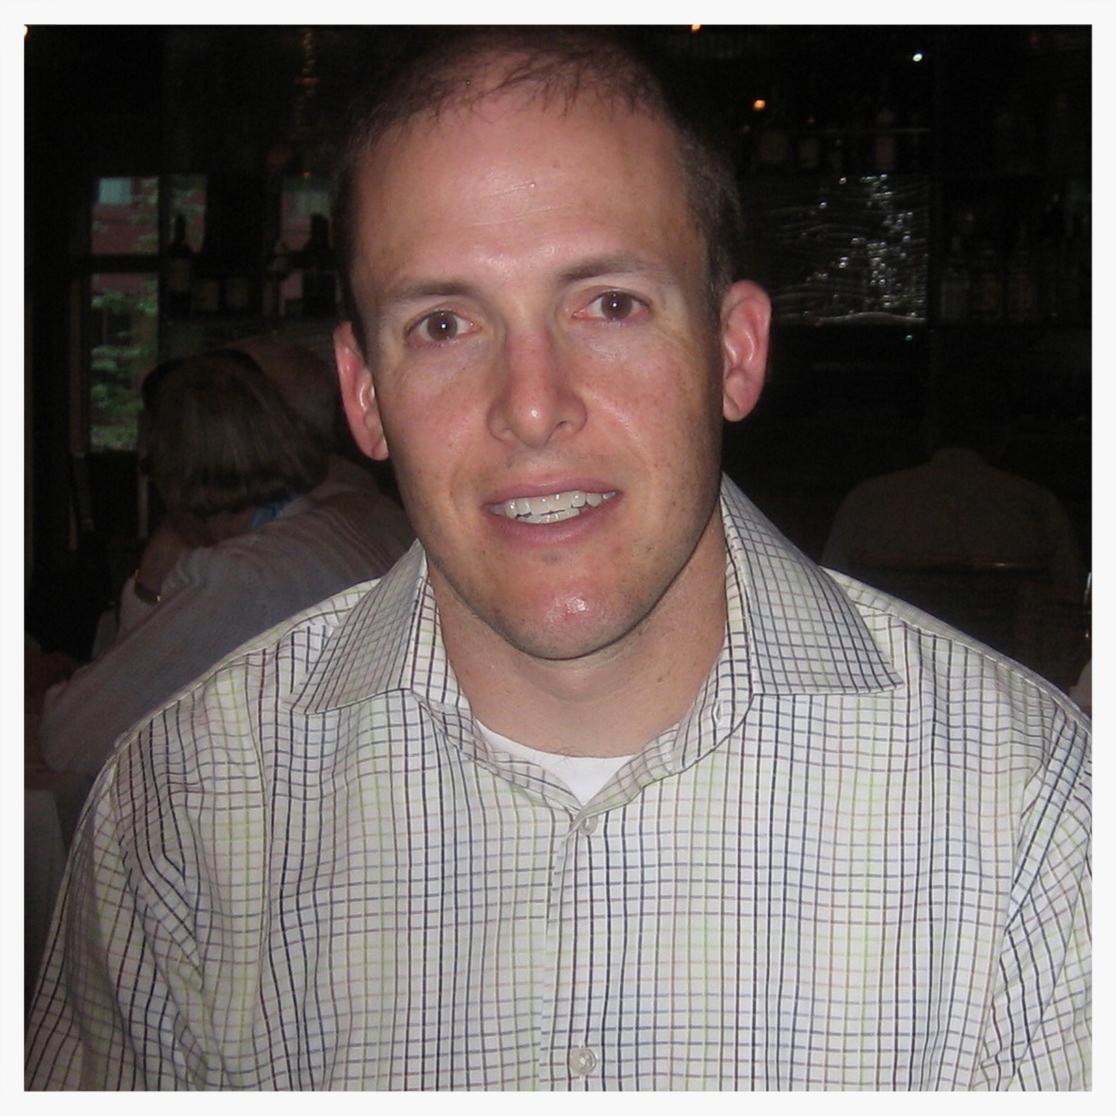 Mark Cutler